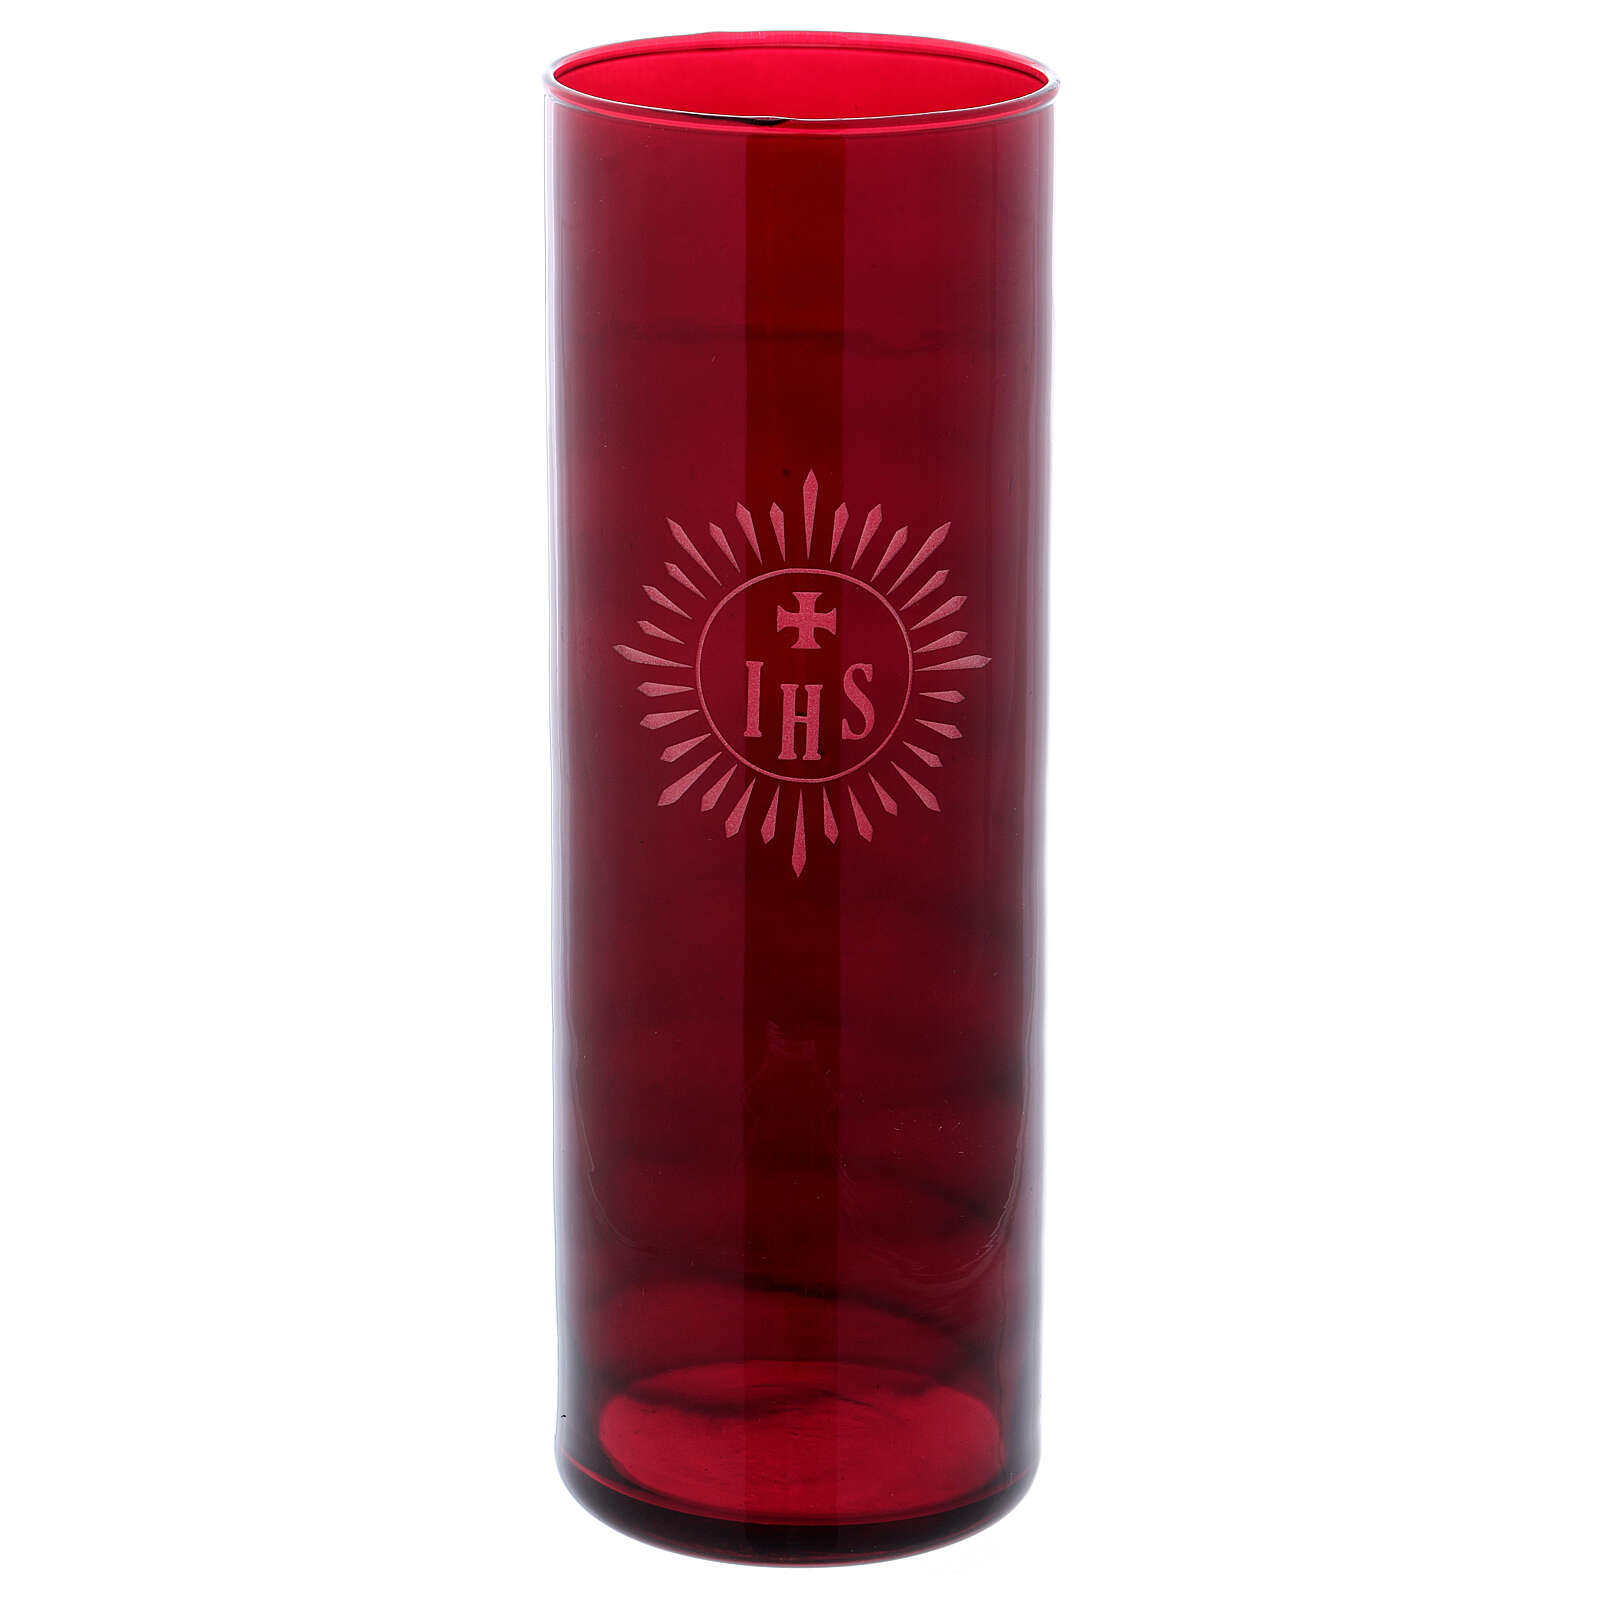 Porta círio copo vermelho IHS 3